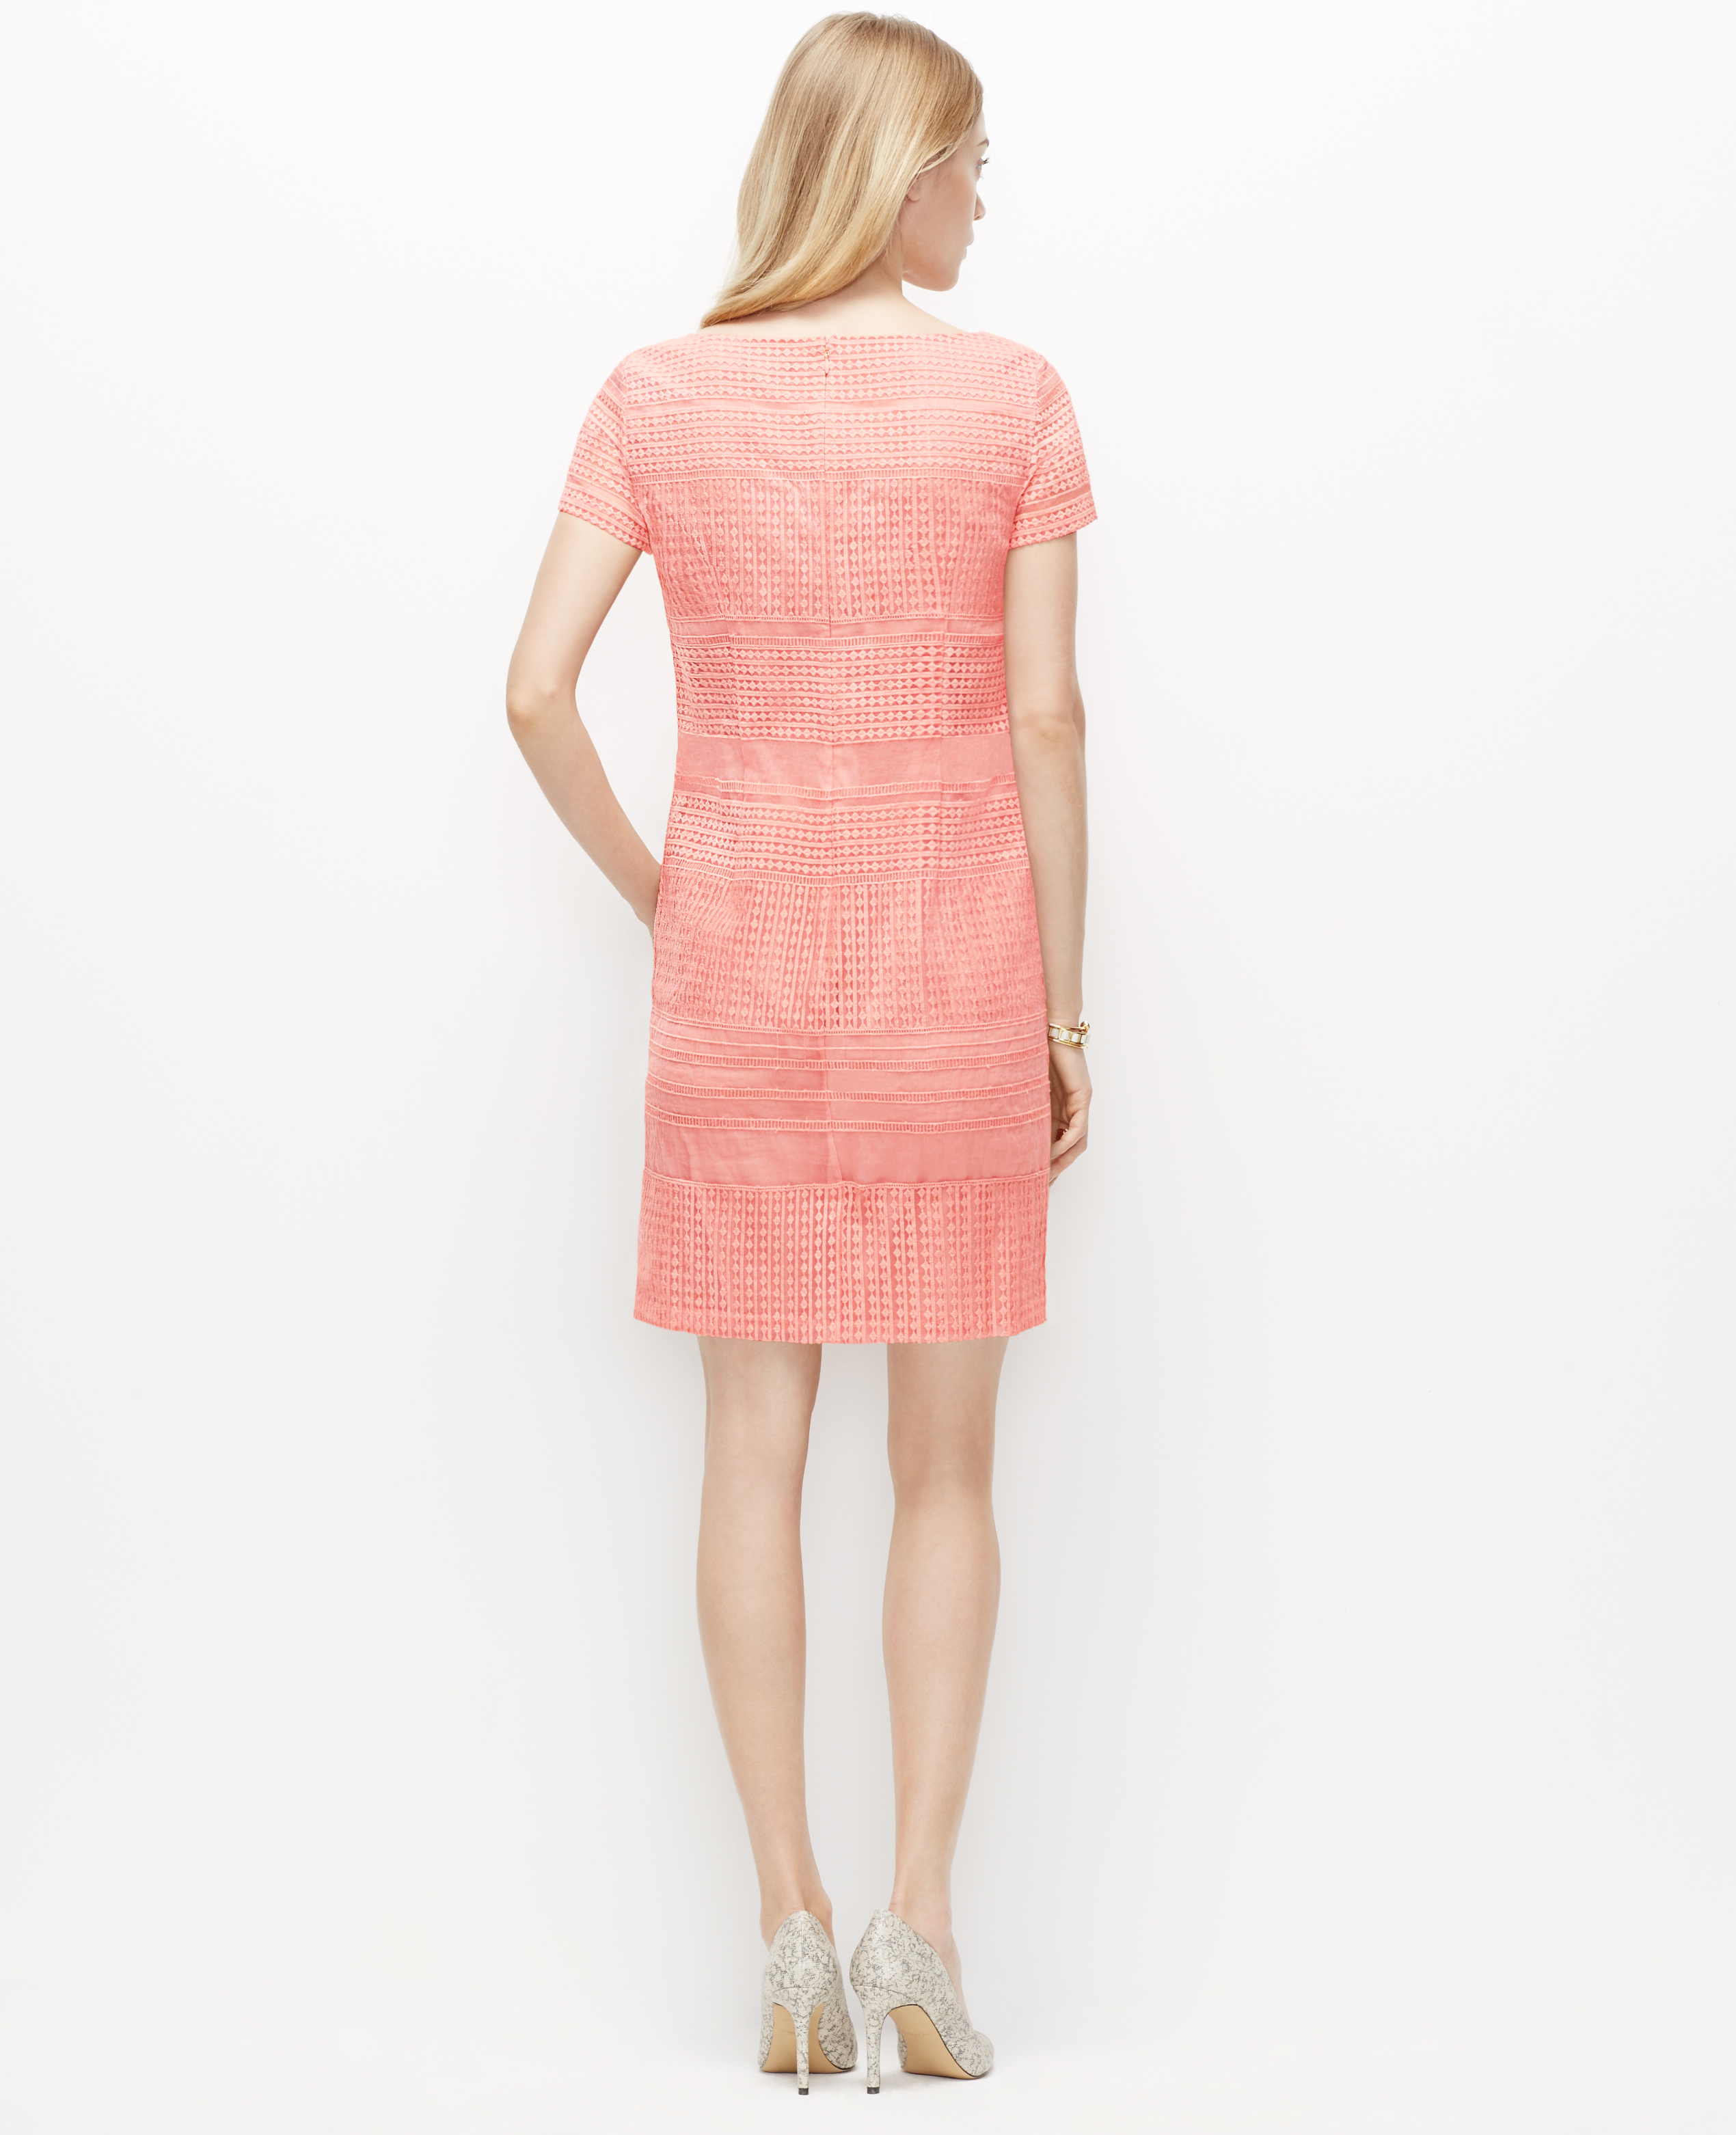 a49b5dde45 Ann Taylor Petite Organza Lace Shift Dress in Pink - Lyst